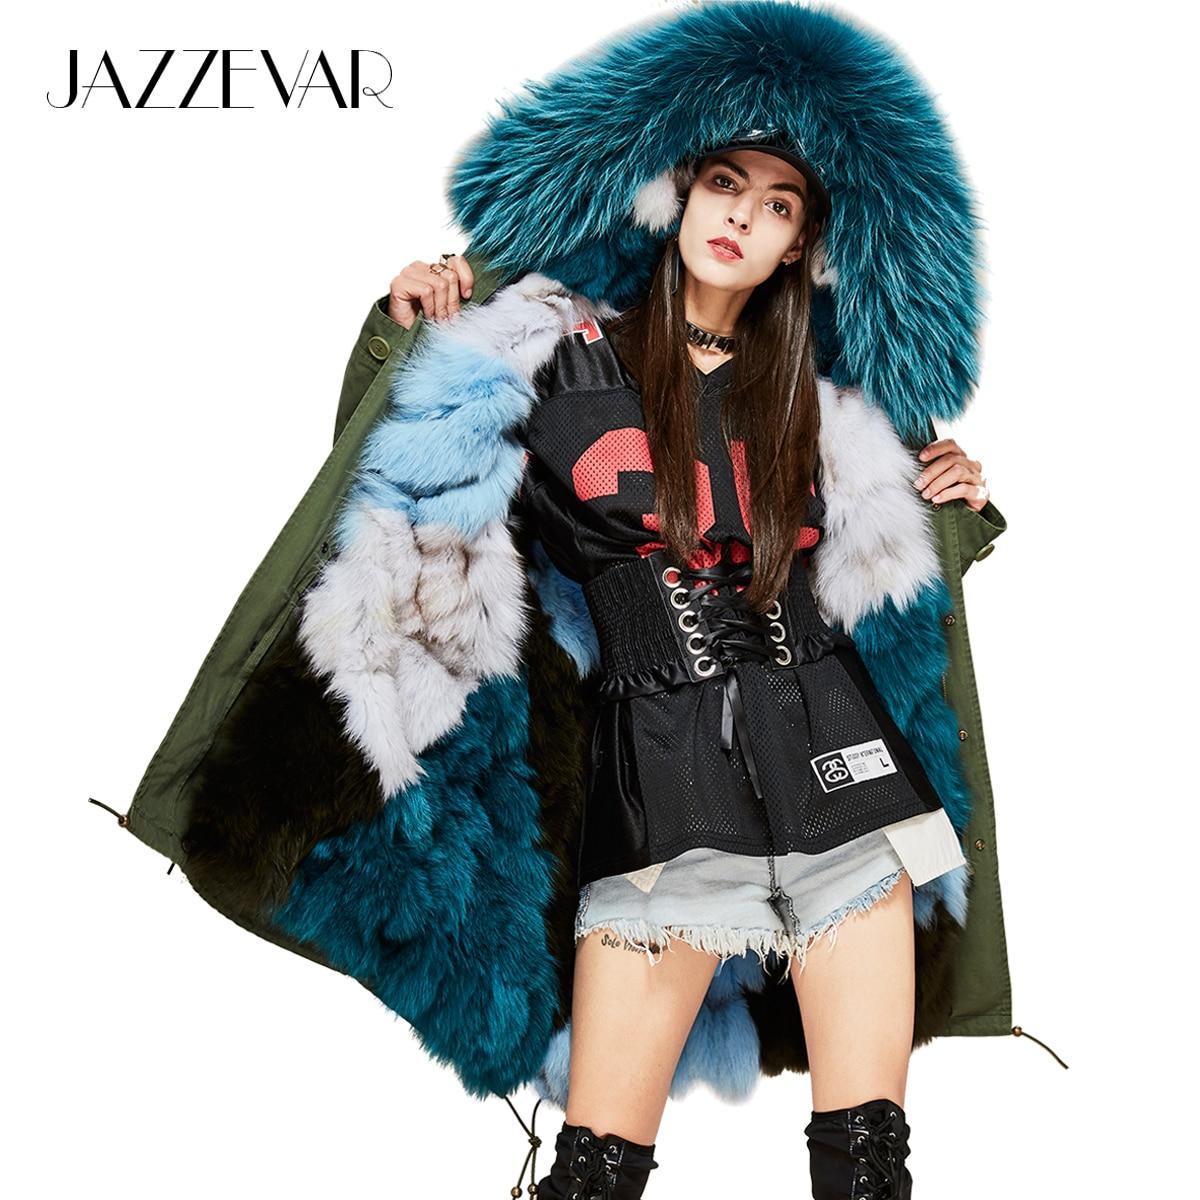 JAZZEVAR 2019 New Woman Luxurious Real Fox Fur Lining Military Parka MIDI Large Raccoon Fur Hooded Coat Outwear Winter Jacket